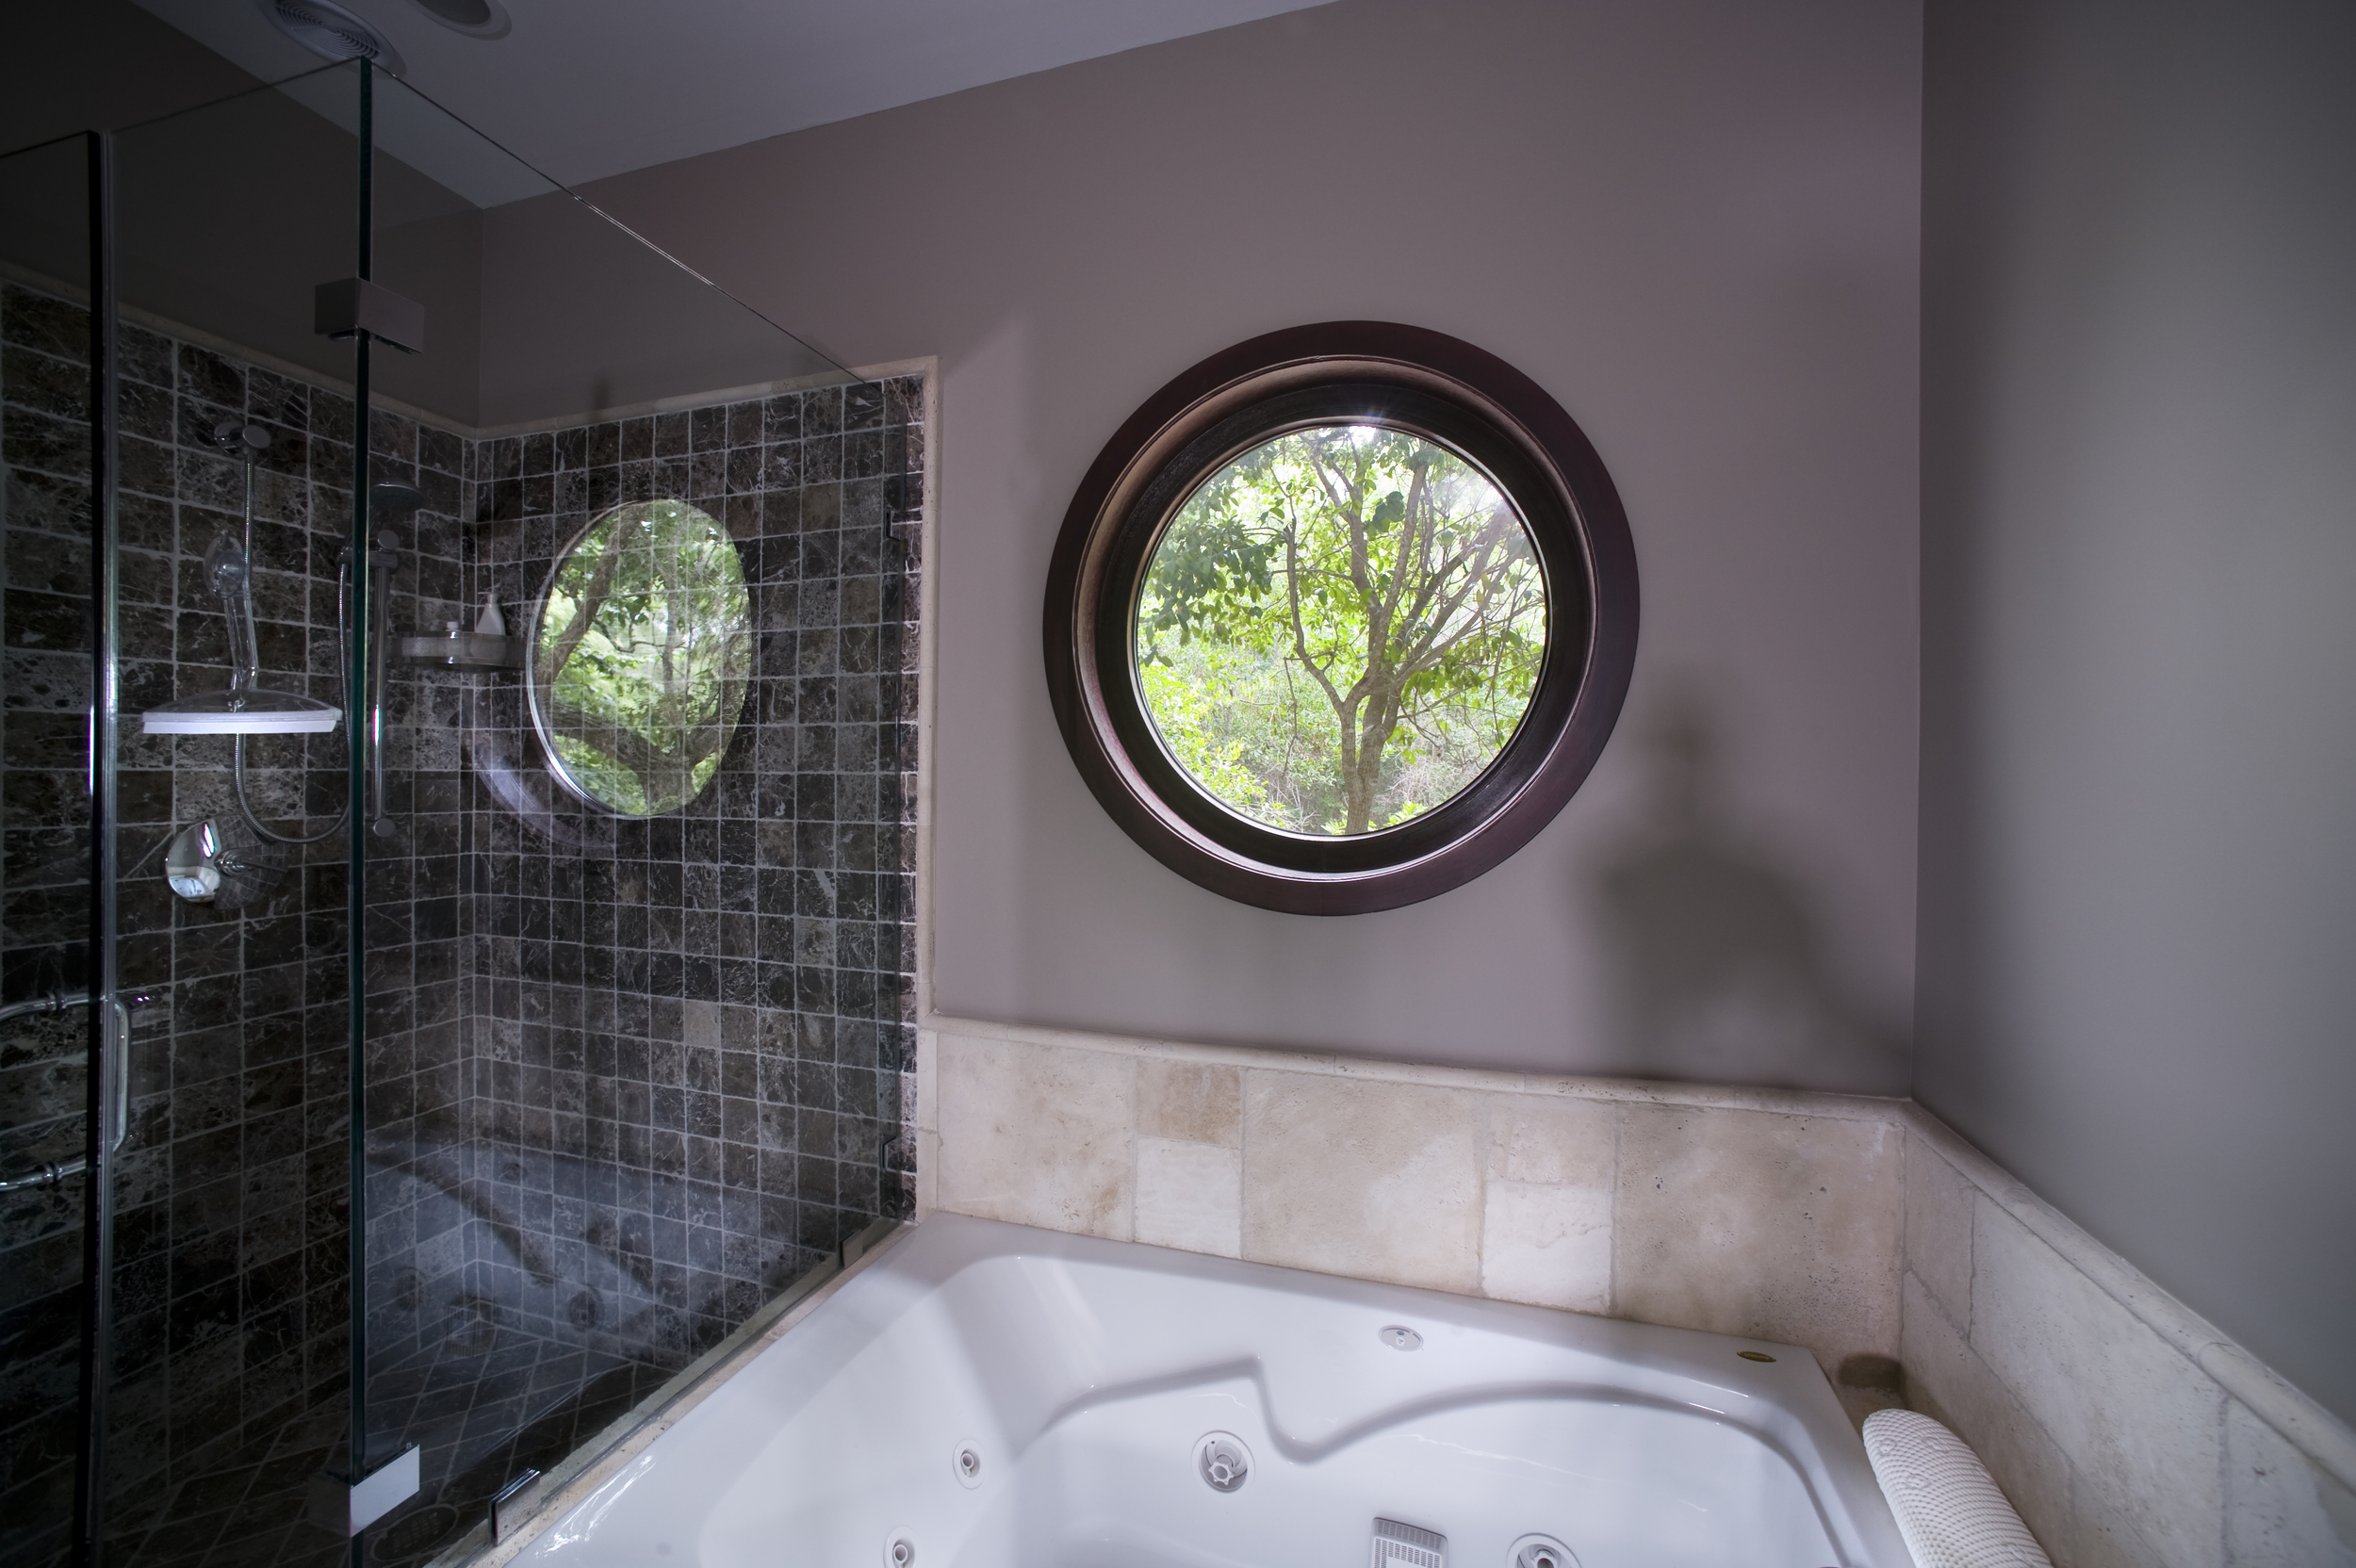 Circular Wood Grain Laminated Vinyl Window